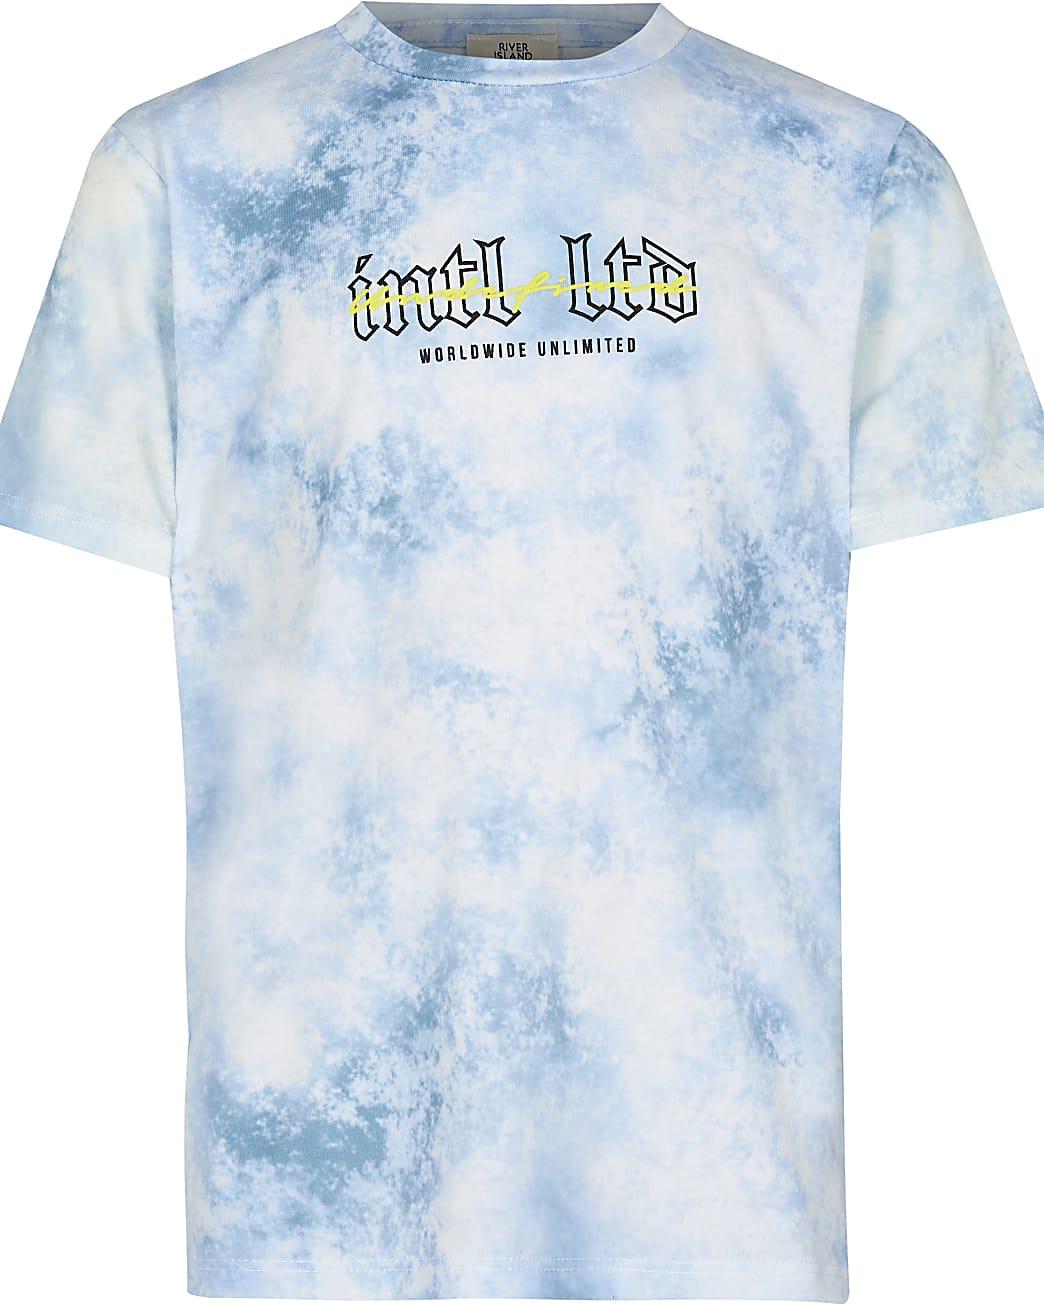 Boys blue tie dye back print t-shirt